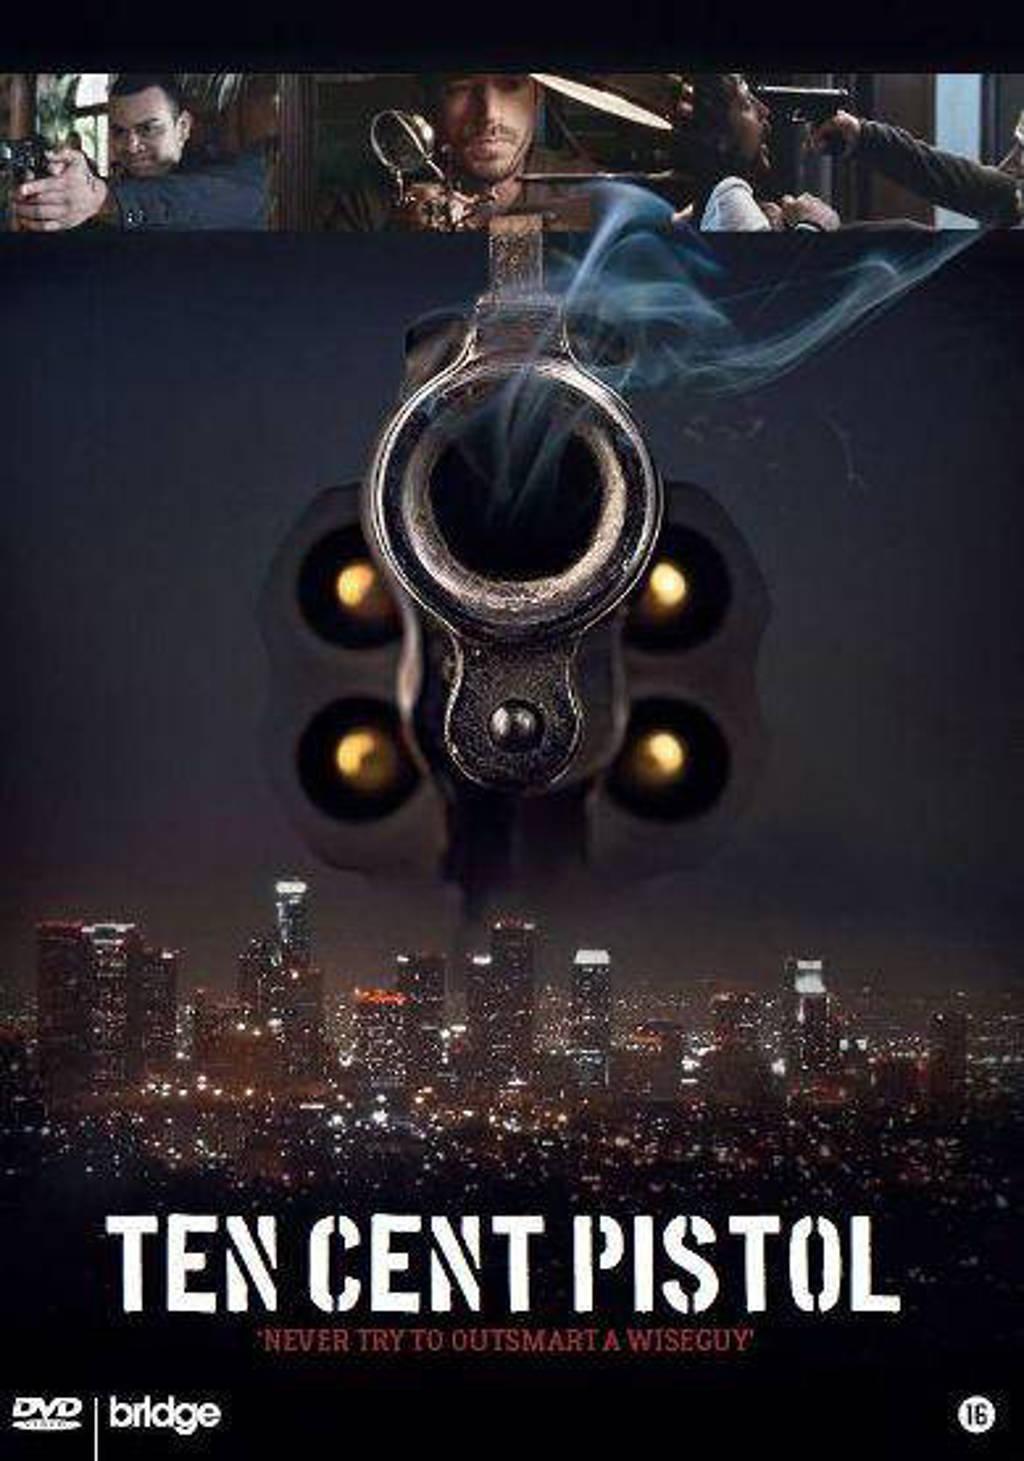 Ten cent pistol (DVD)